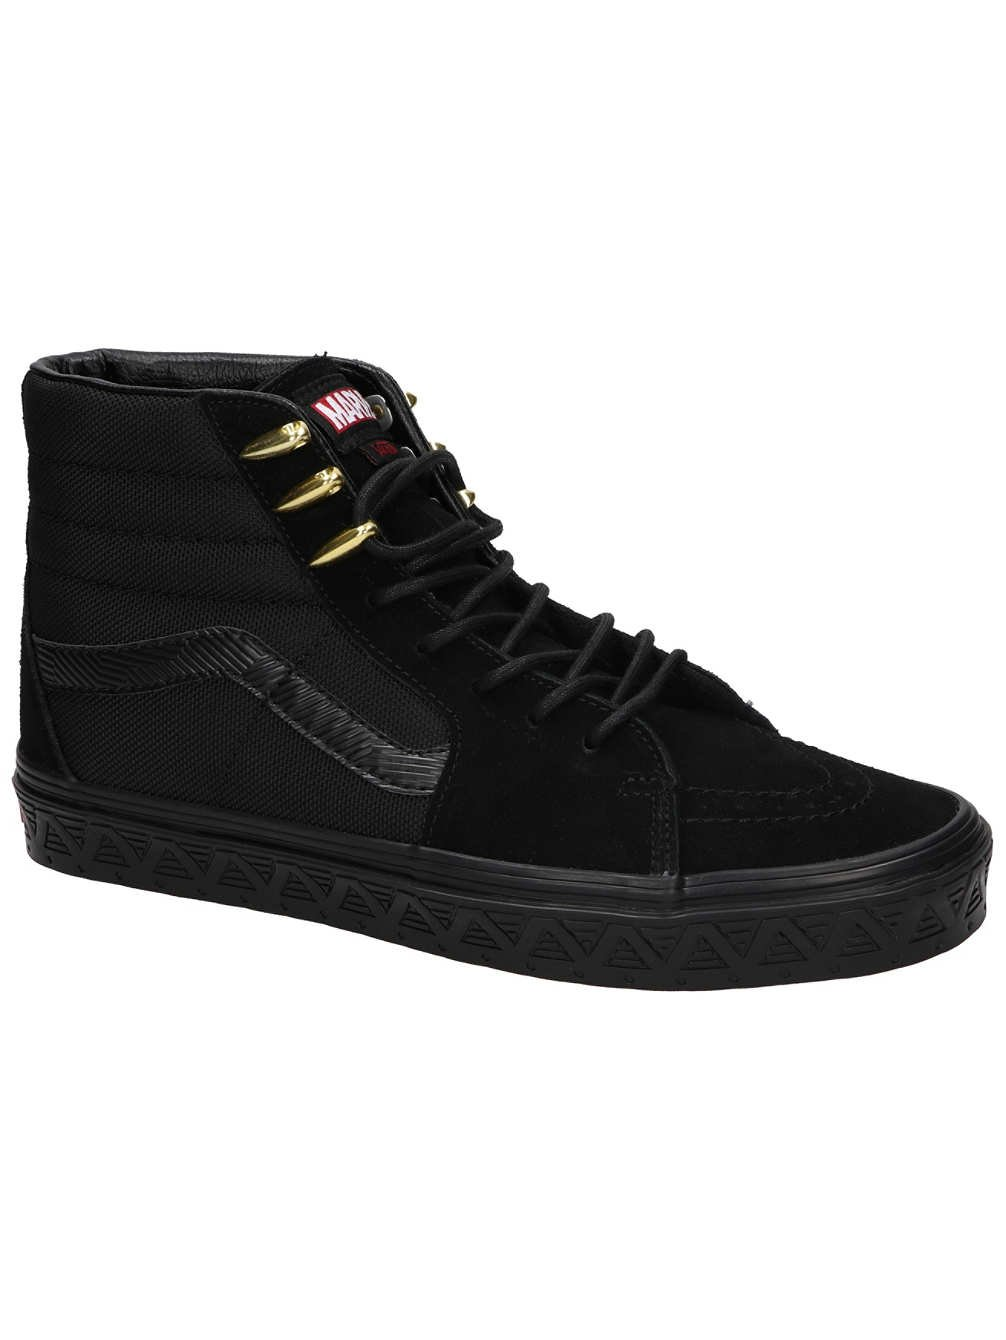 Vans Spider-Man/Black Classic Slip-On (Marvel) Spider-Man/Black Vans VN0A38F79H7 Skate Shoes B077T67CF4 Fashion Sneakers 115305